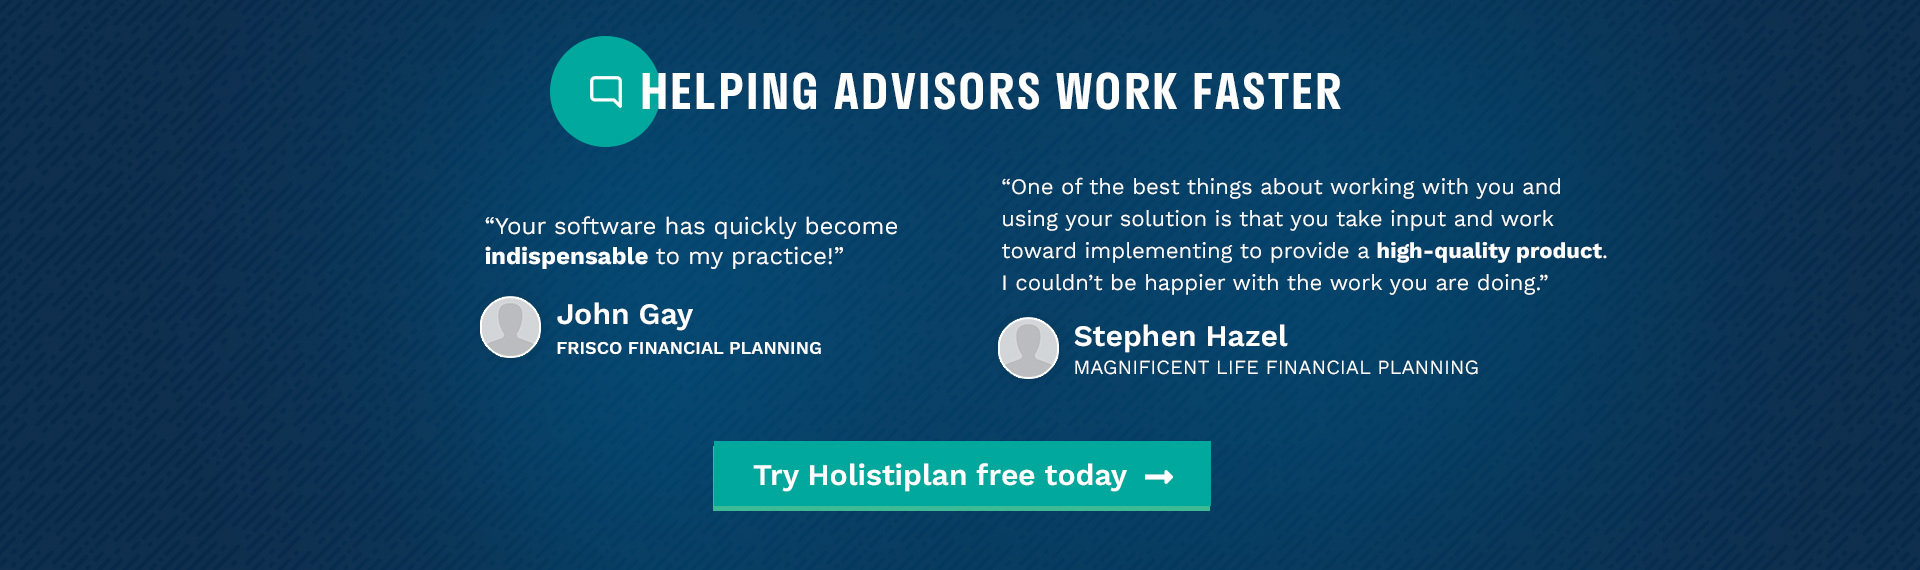 Helping Advisors Work Faster Testimonials